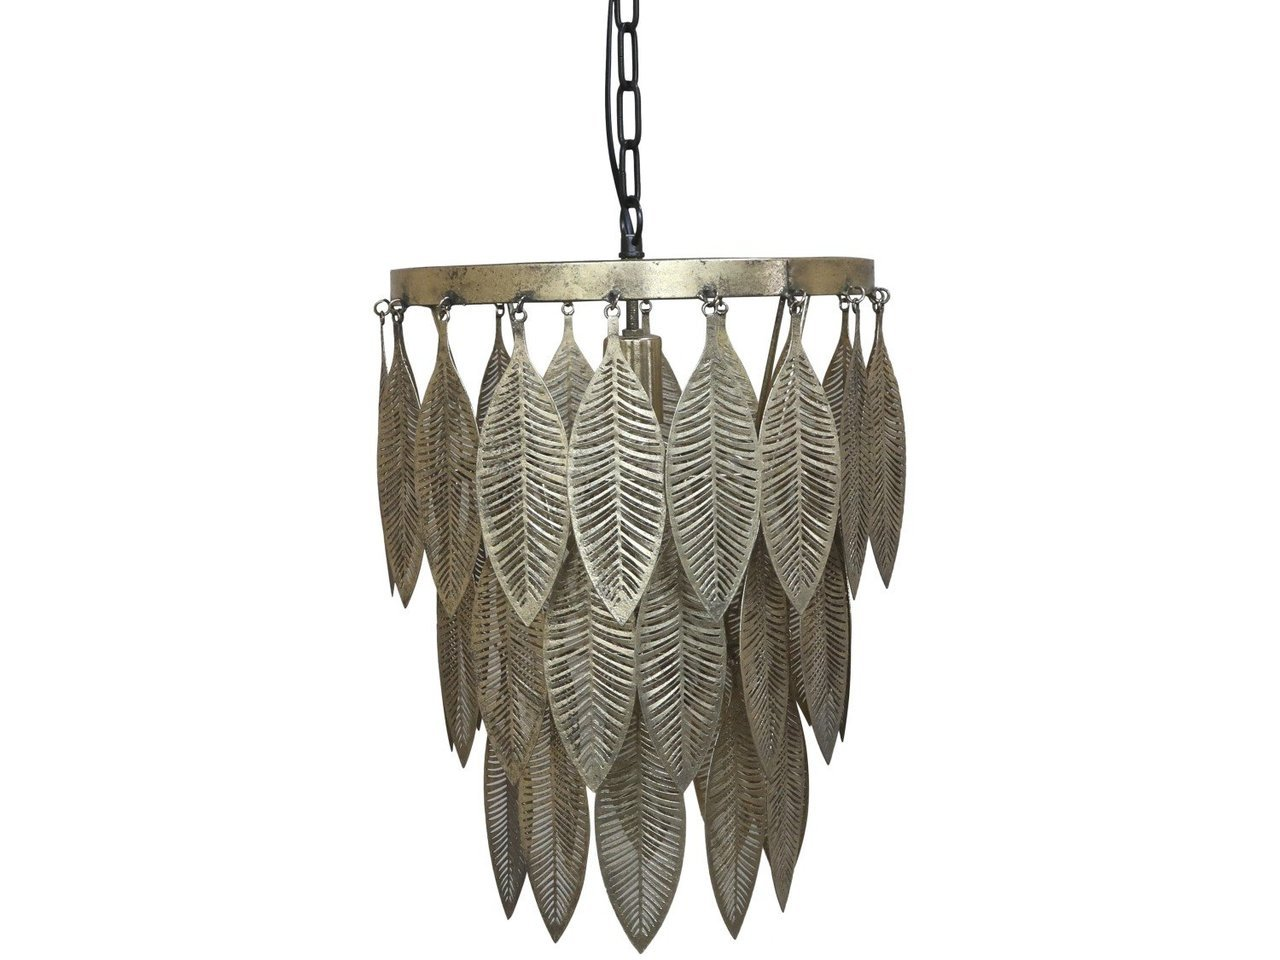 Chic Antique Lampe mit Metalldekoration